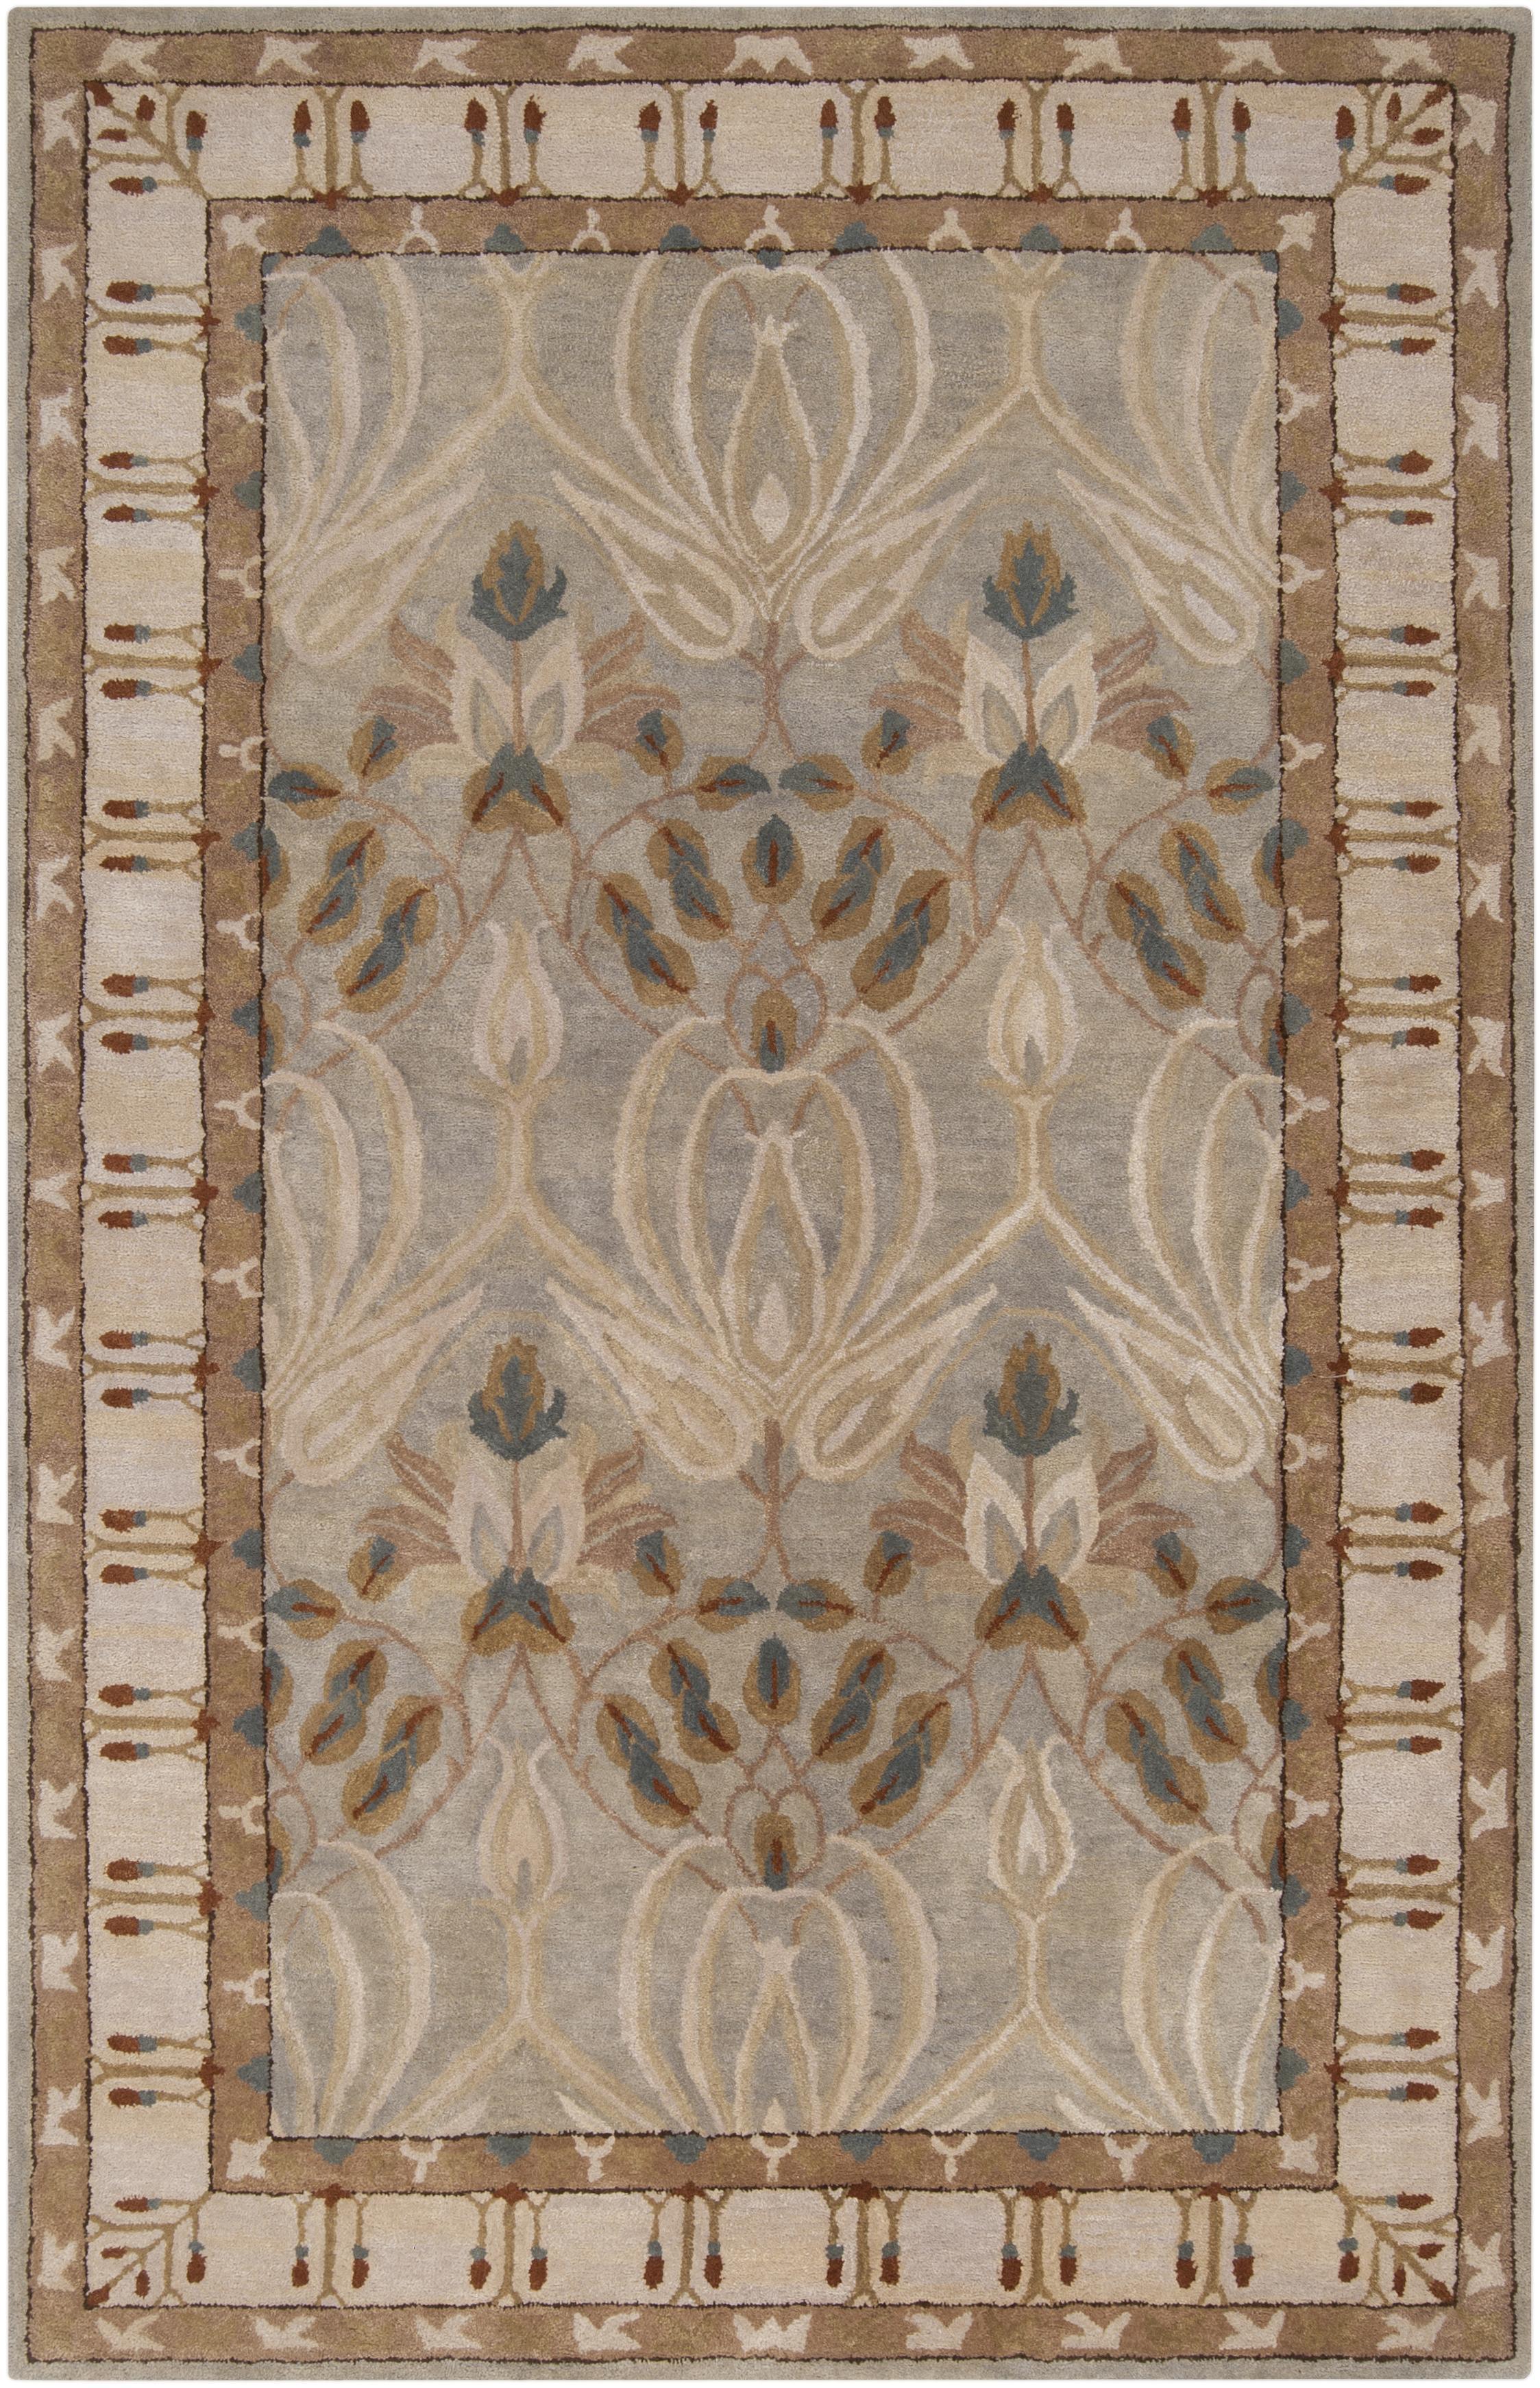 Surya Rugs Mentone 5' x 8' - Item Number: MTO7000-58